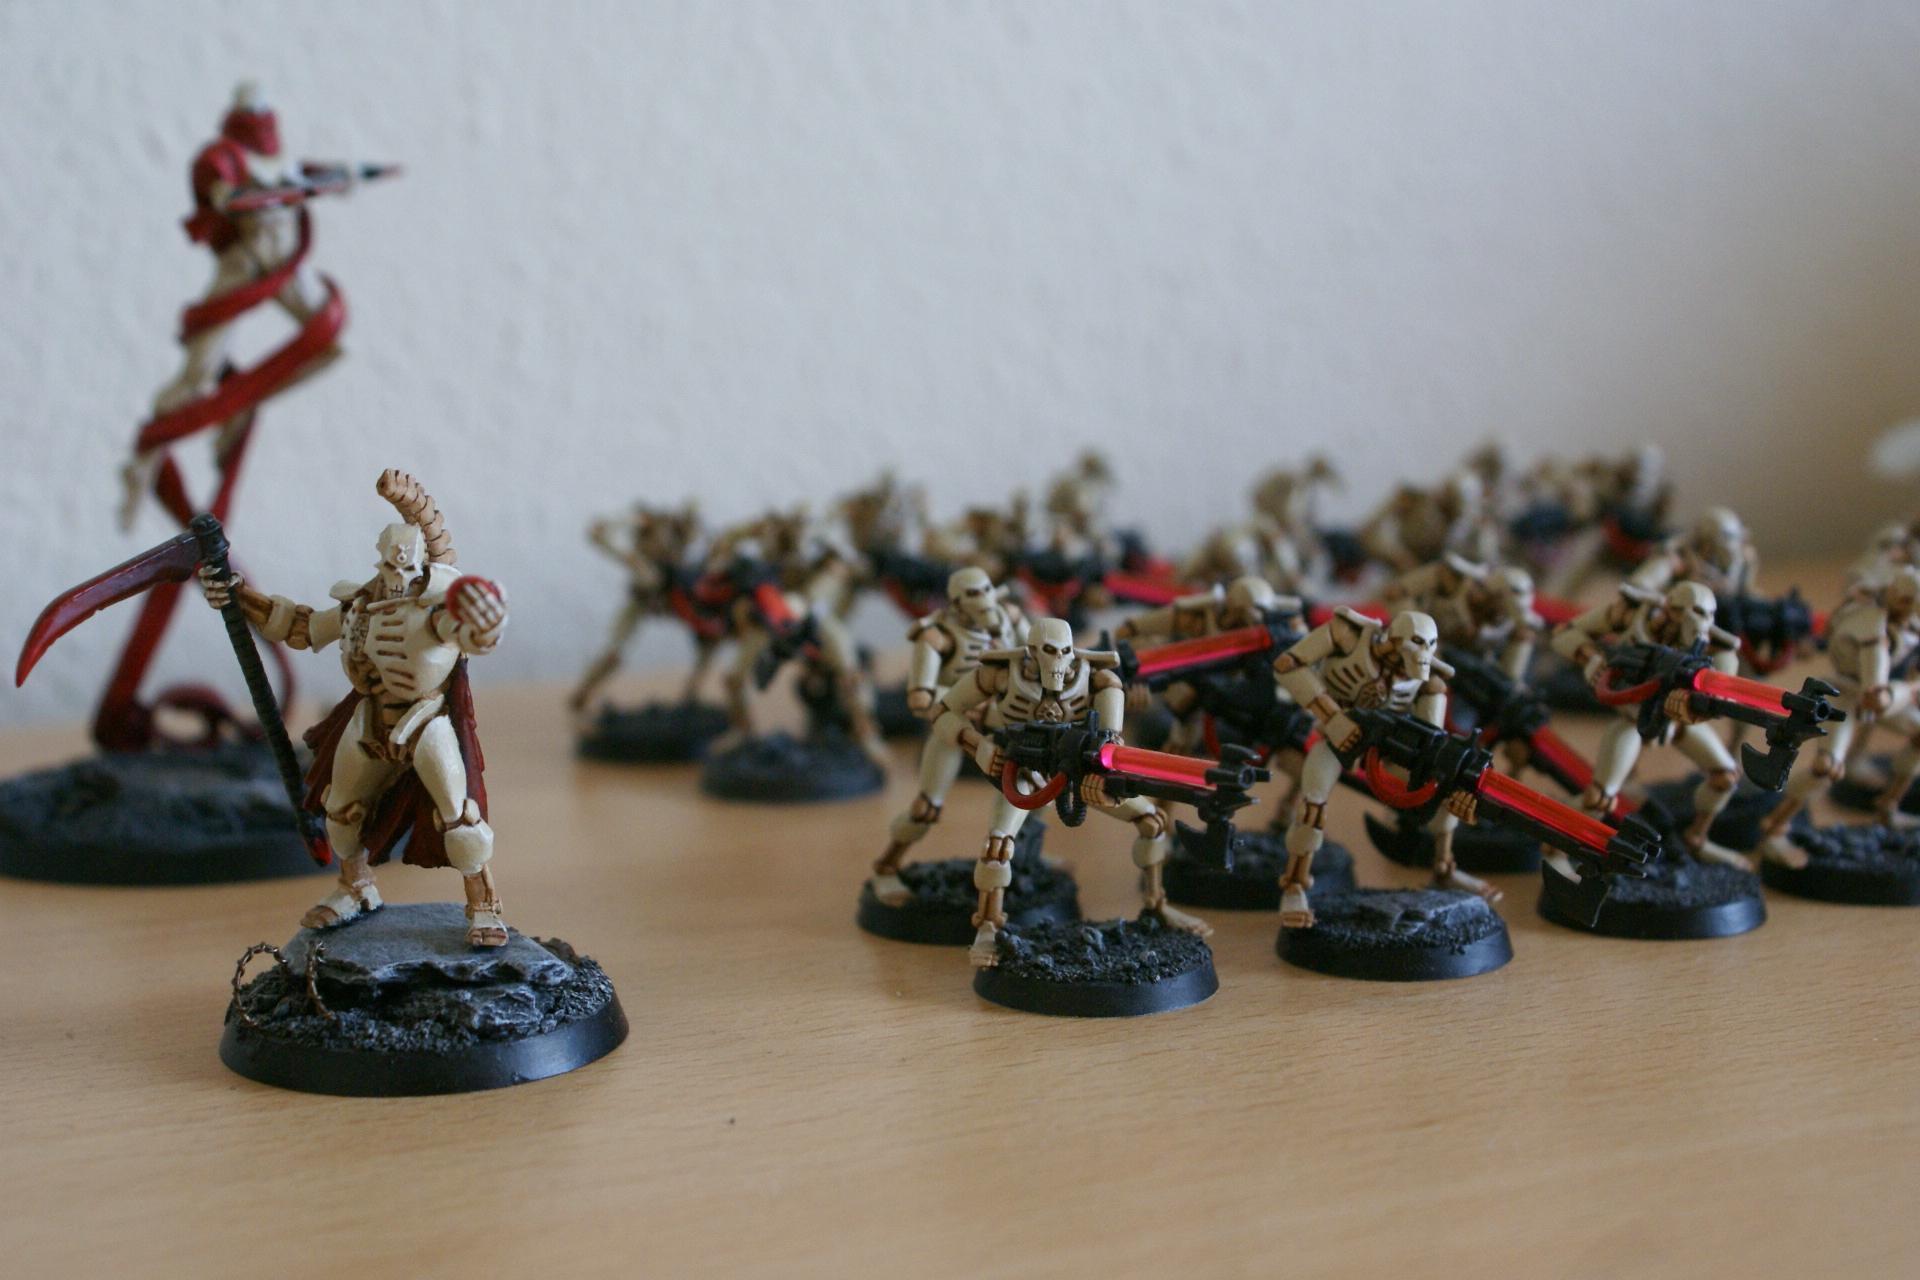 Bone, Necron Lord, Necron Warriors, Necrons